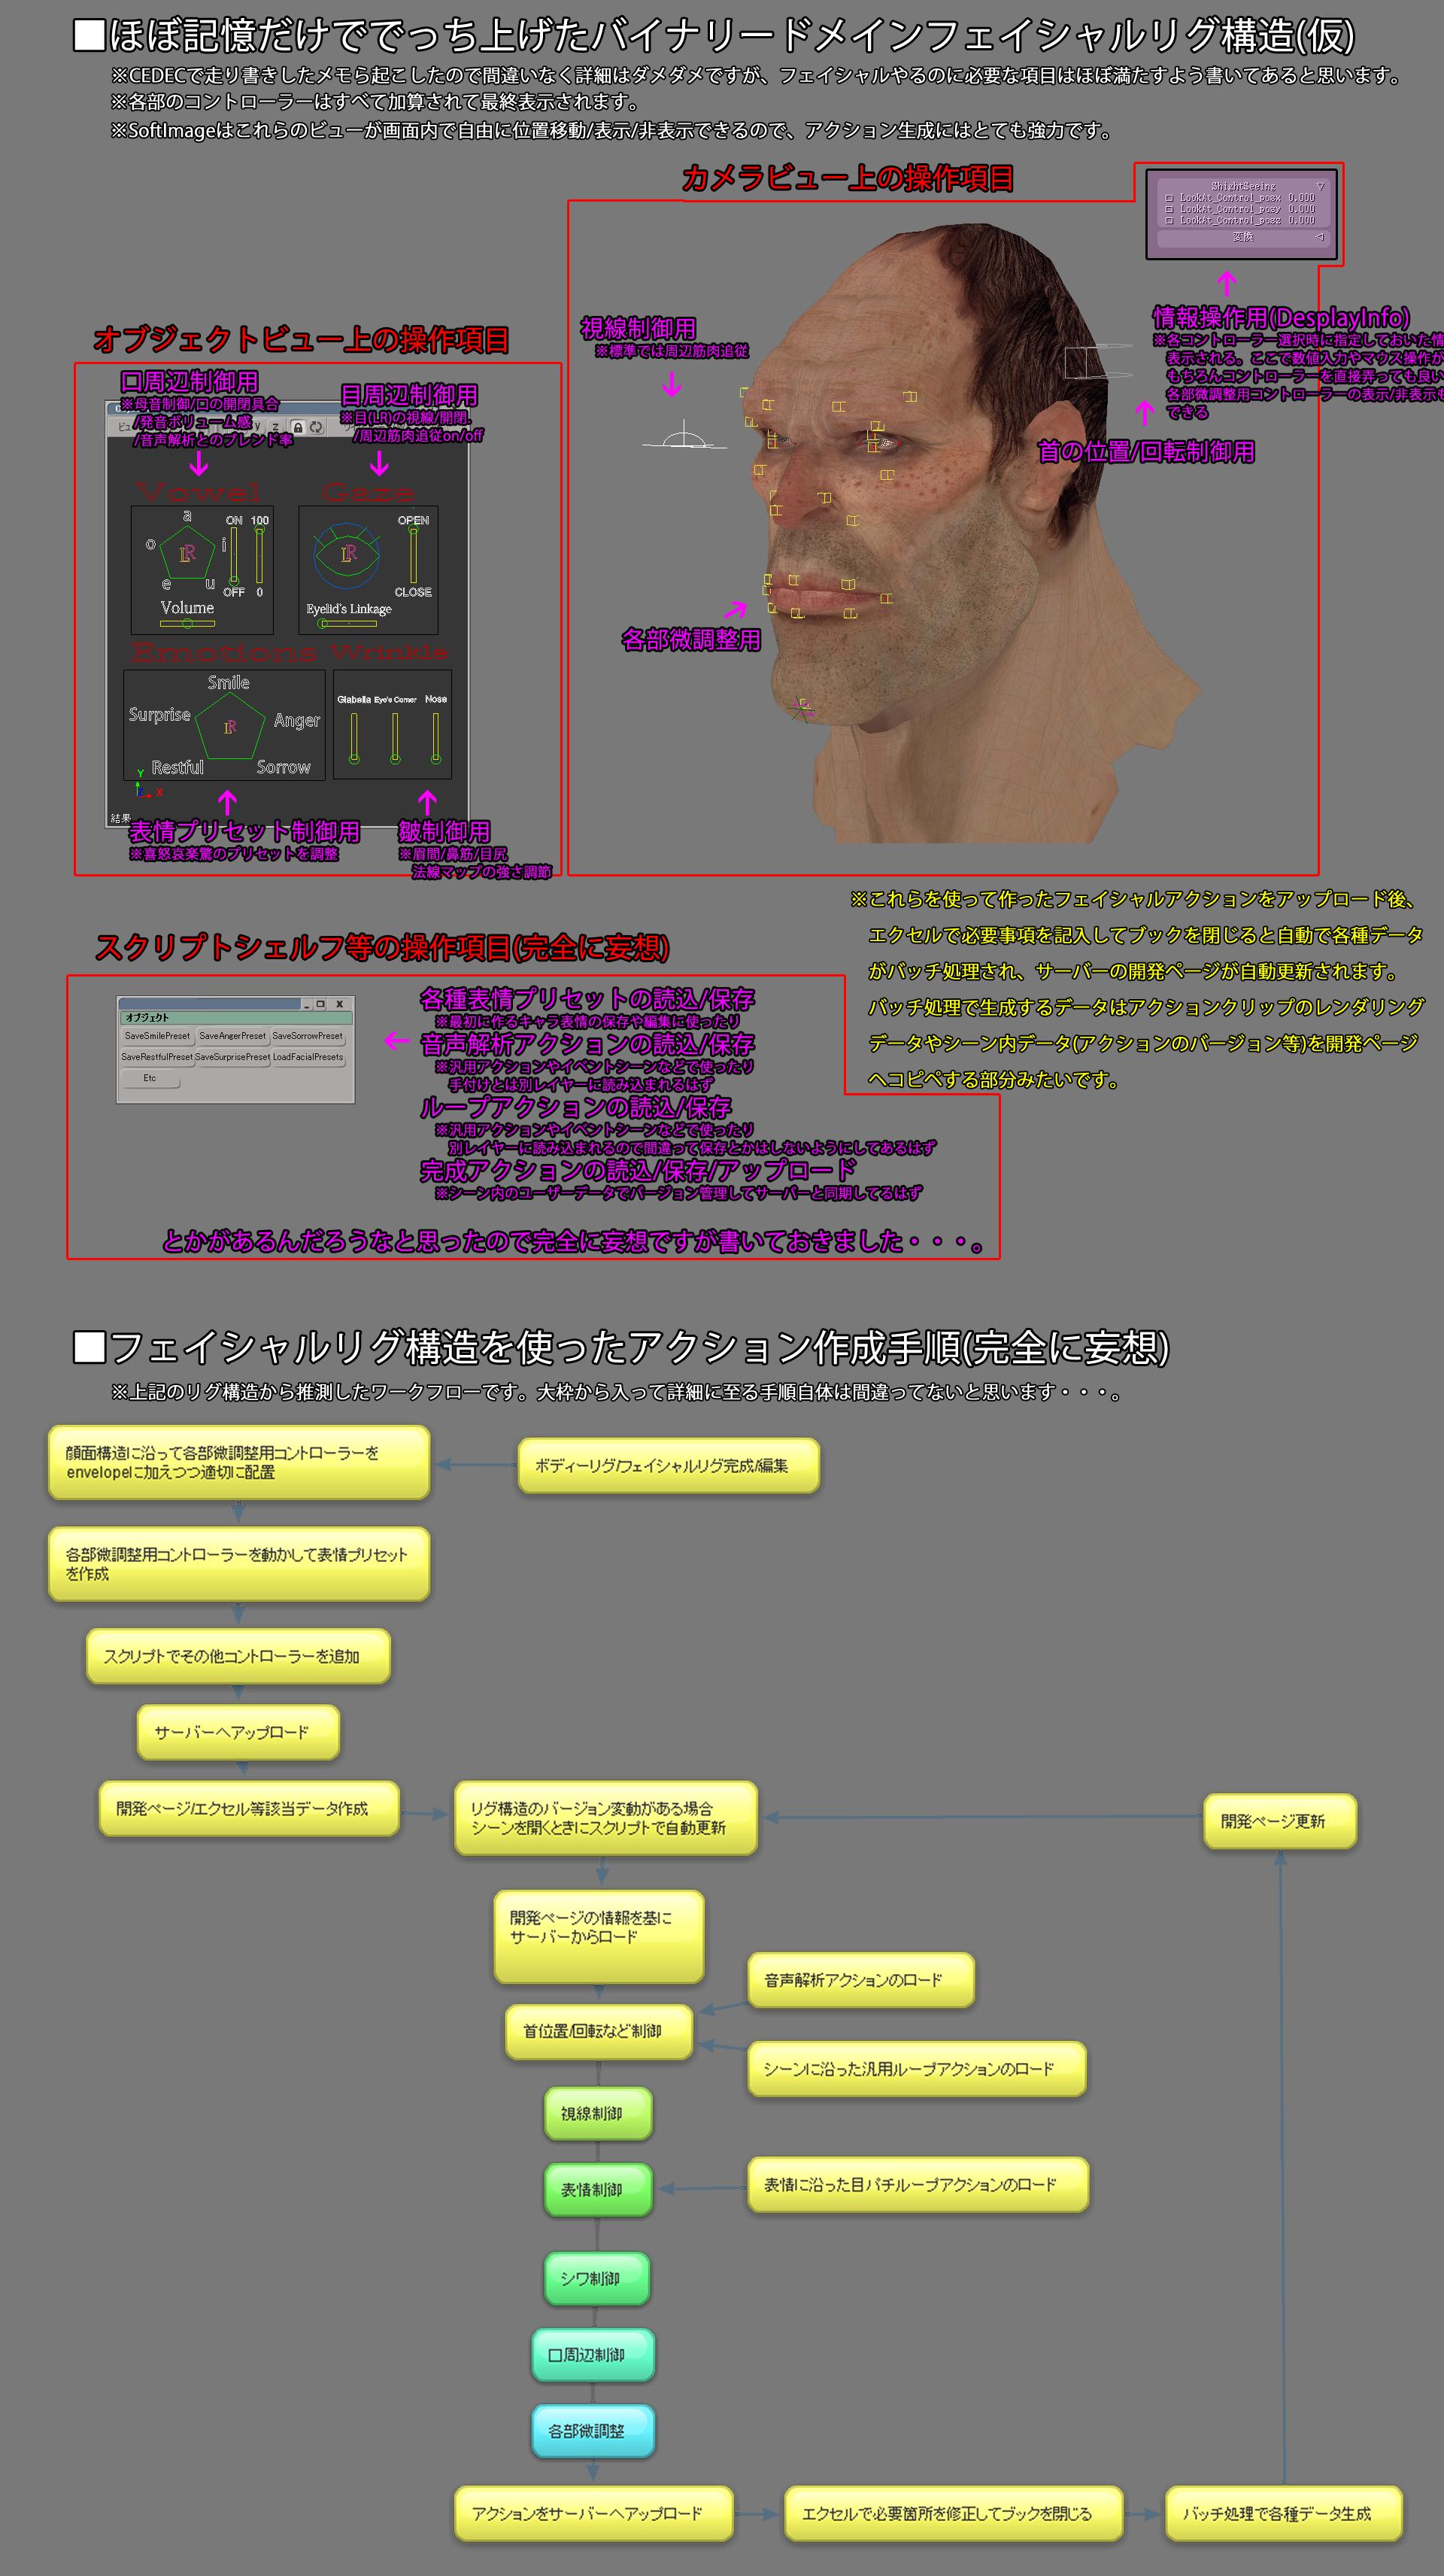 http://fc01.deviantart.net/fs71/f/2012/239/f/8/facial_rig_system_in_cedec2012_by_kotobukimansaku-d5cmyzw.png